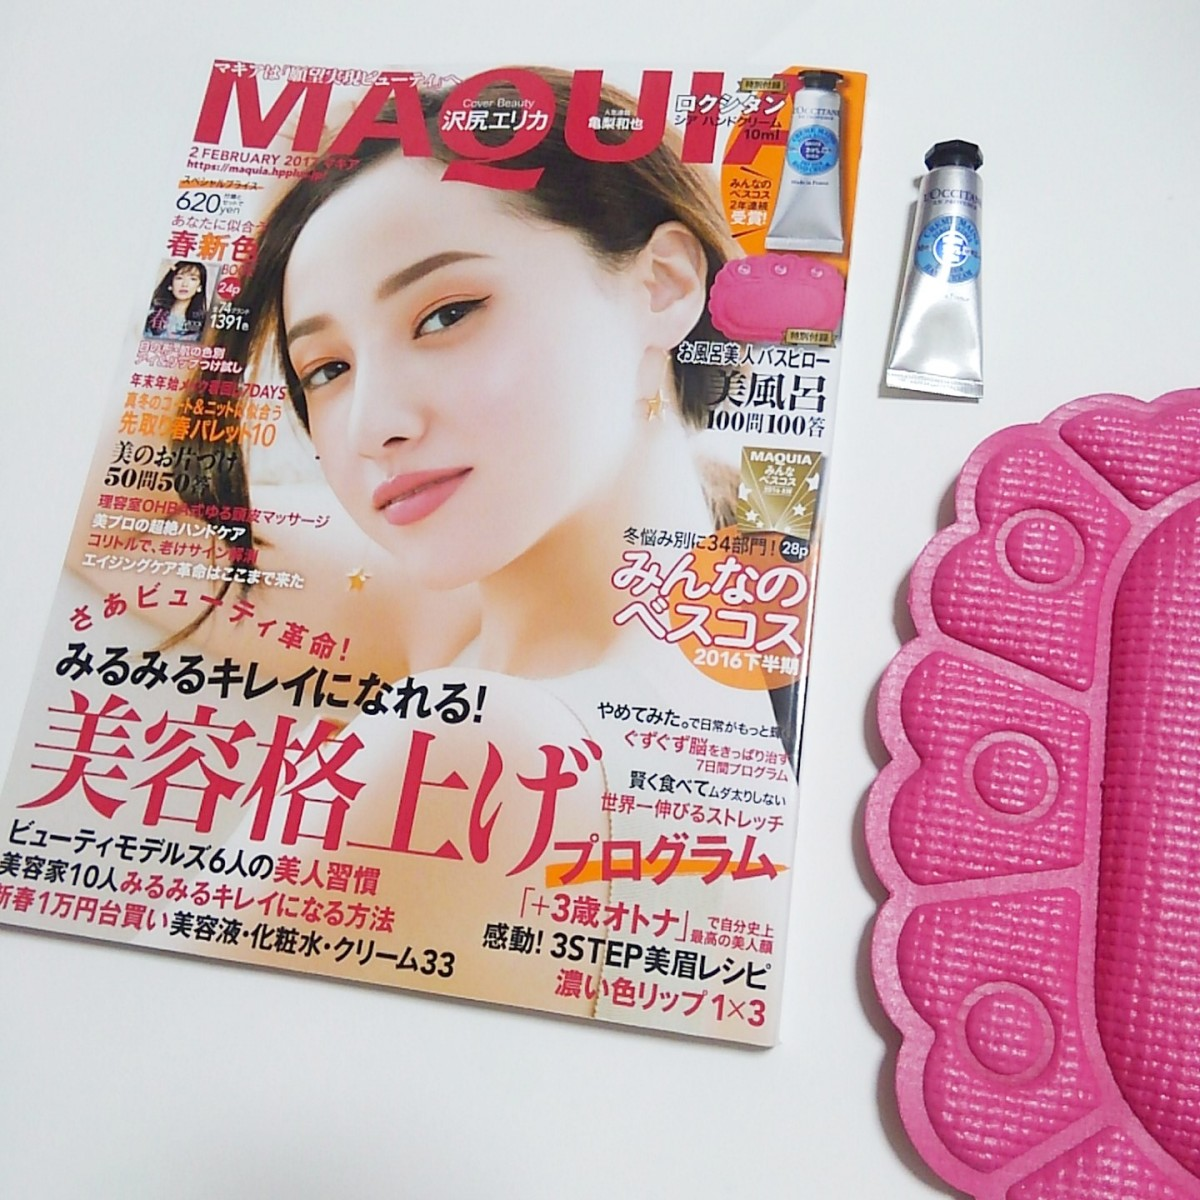 "◆《MAQUIA2月号発売》""美容格上げプログラム""で春待ち美容を始めましょ♪◆"